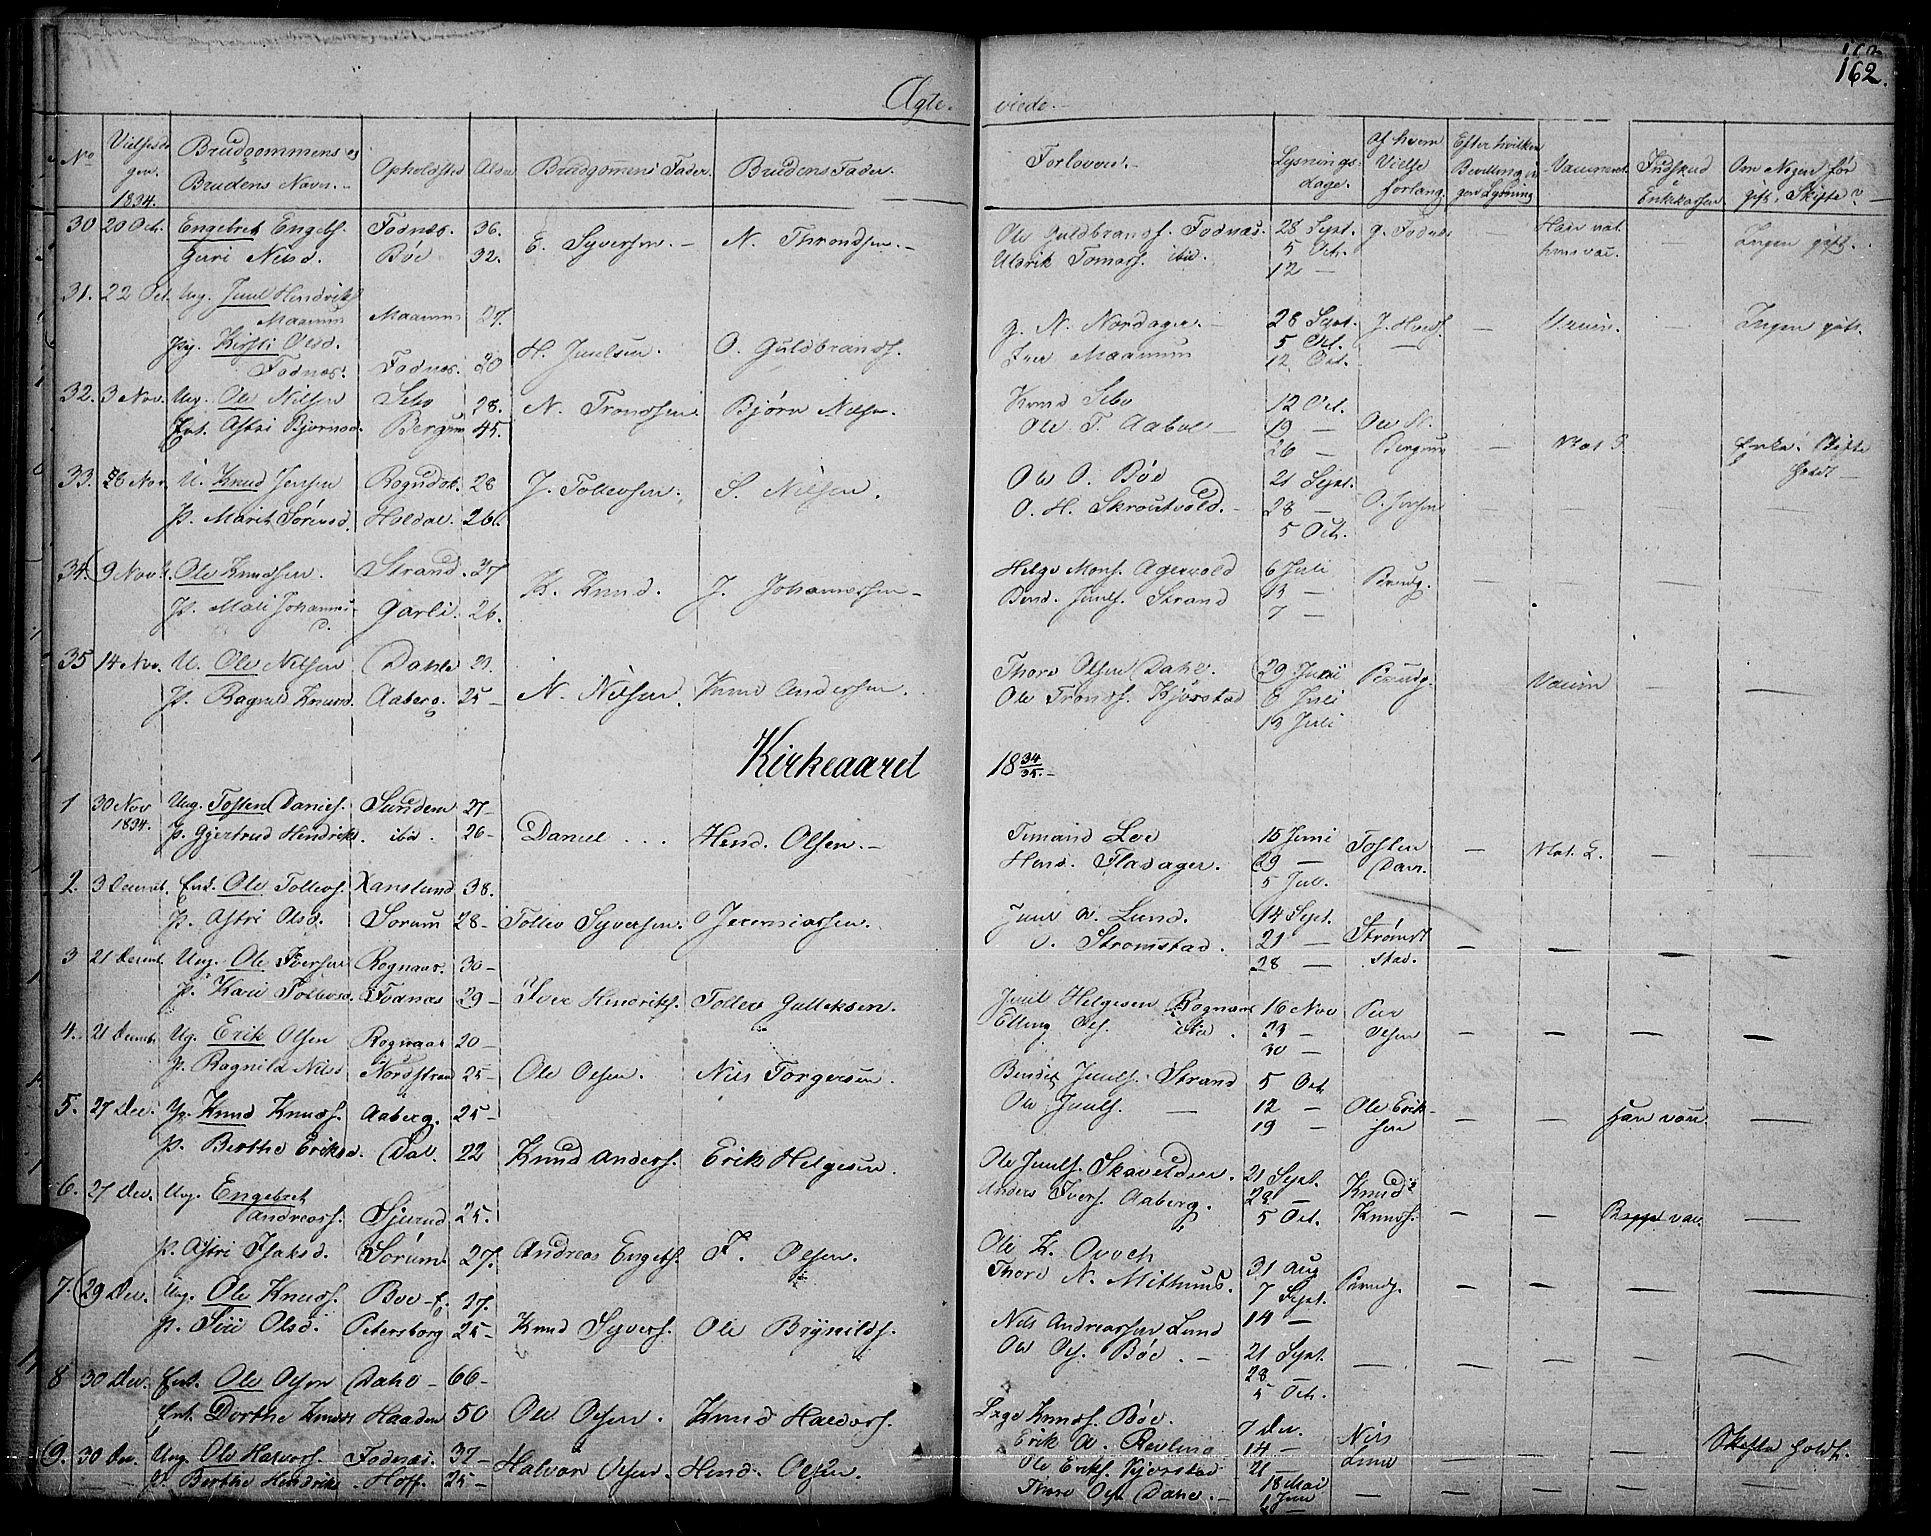 SAH, Nord-Aurdal prestekontor, Ministerialbok nr. 3, 1828-1841, s. 162